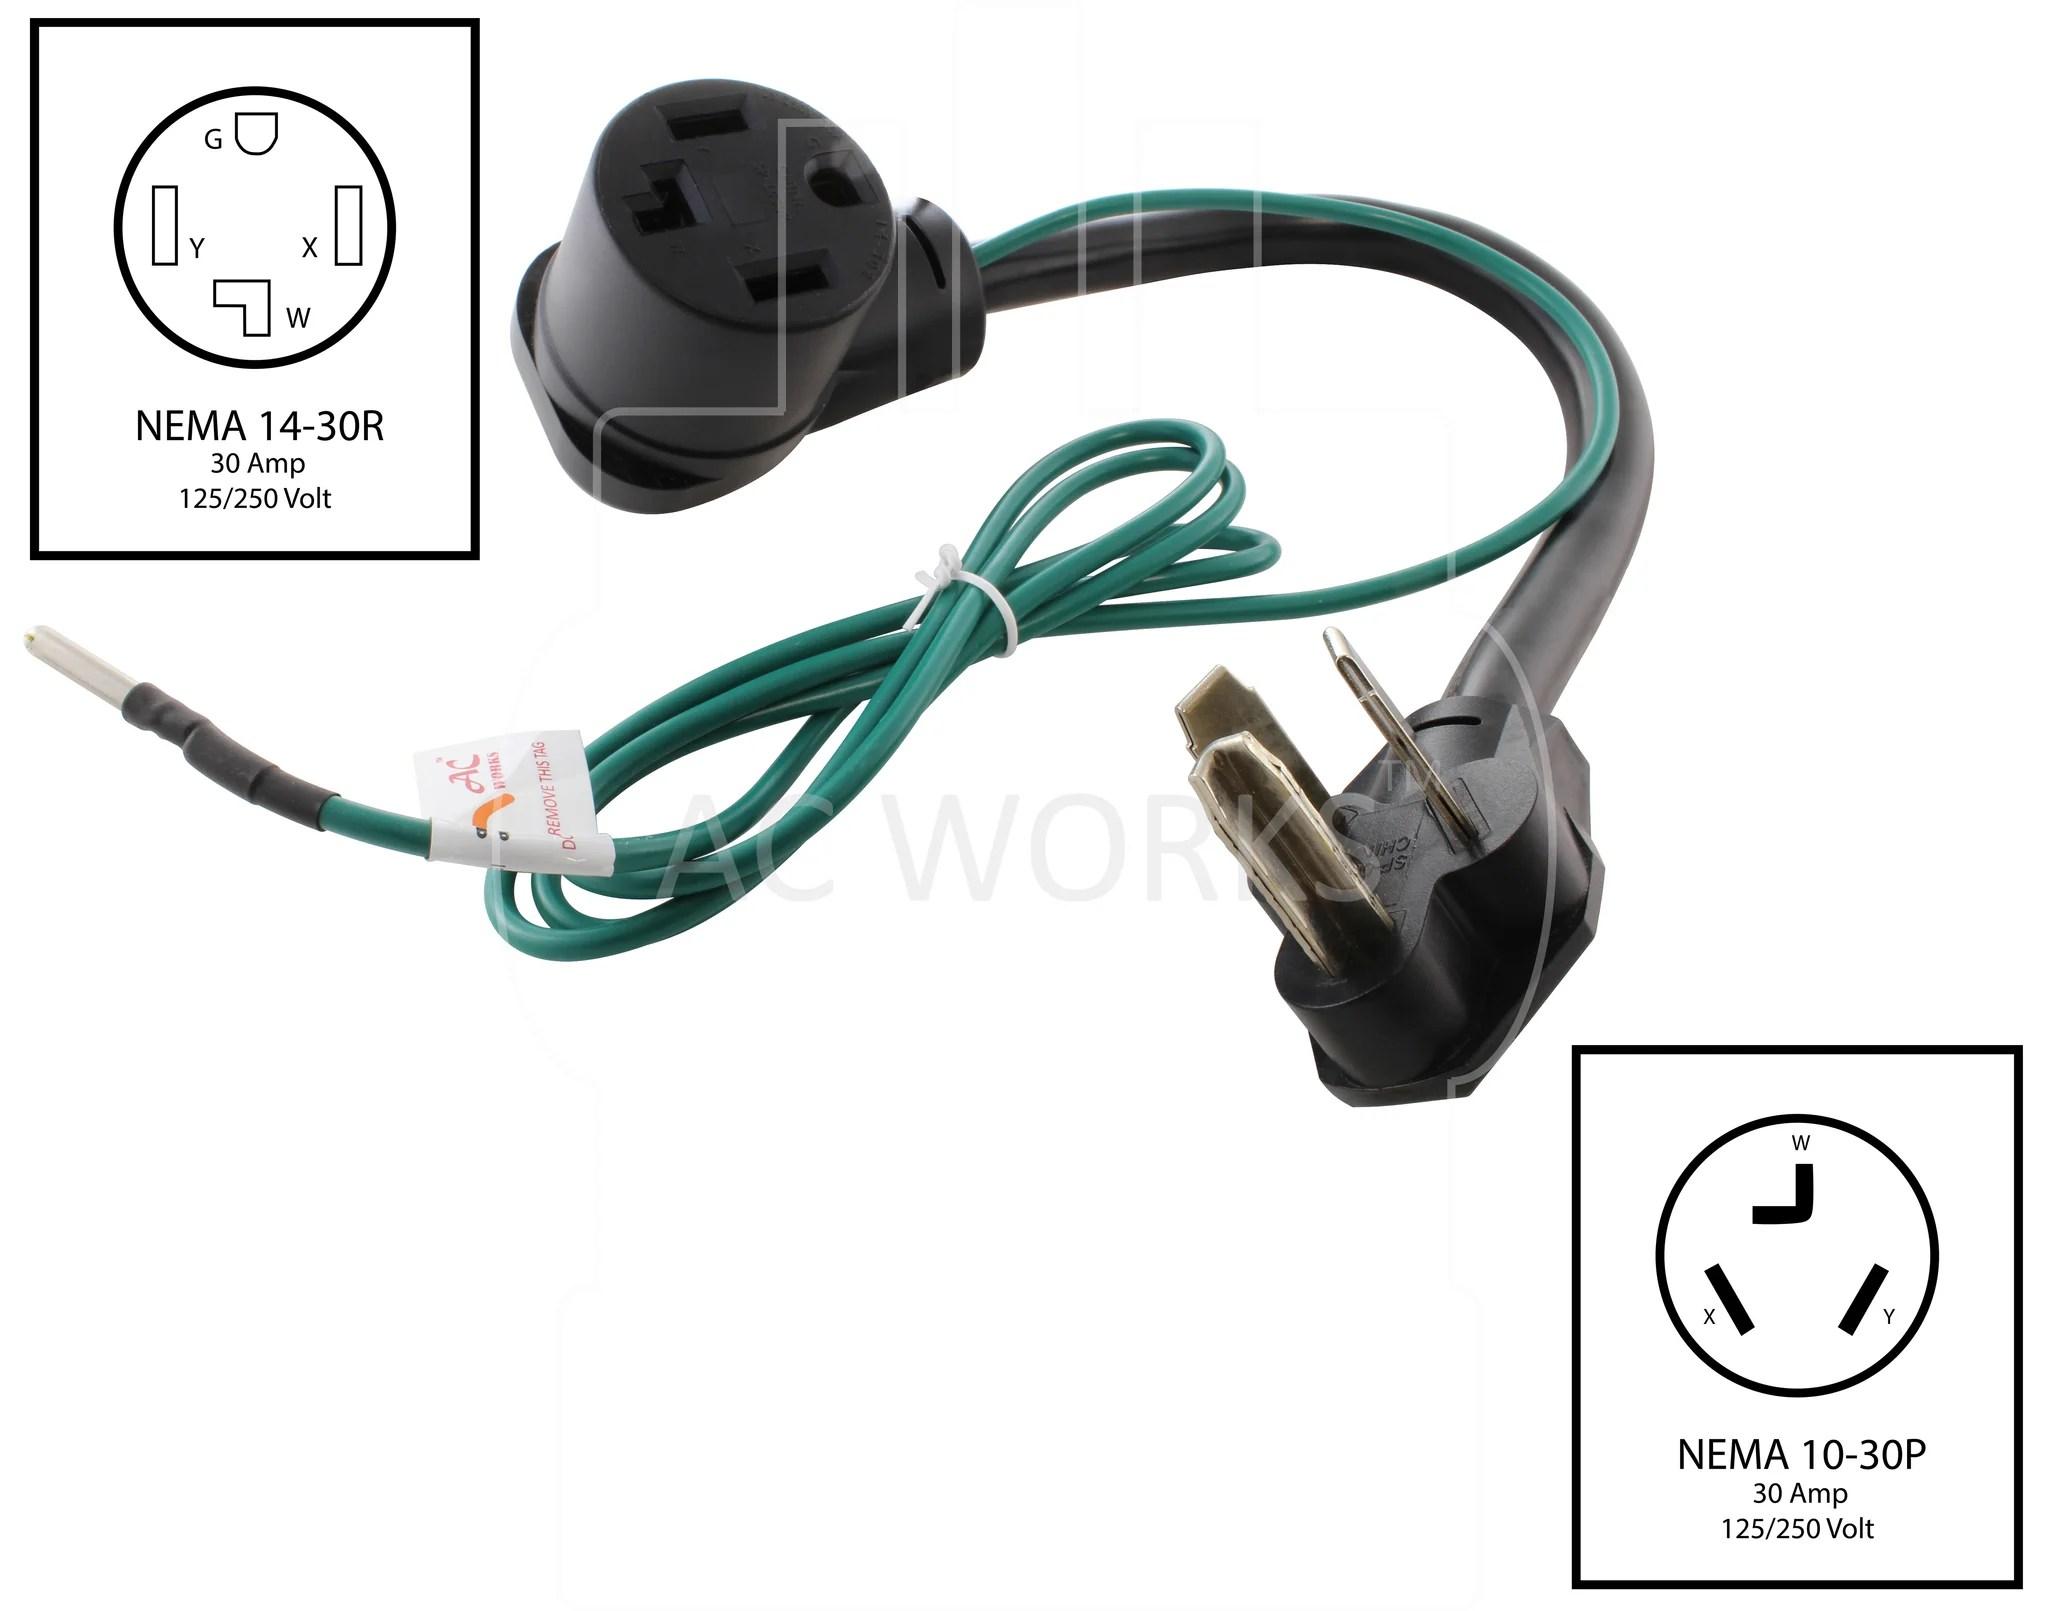 small resolution of  ac works brand 3 prong dryer adapter nema 10 30p to nema 14